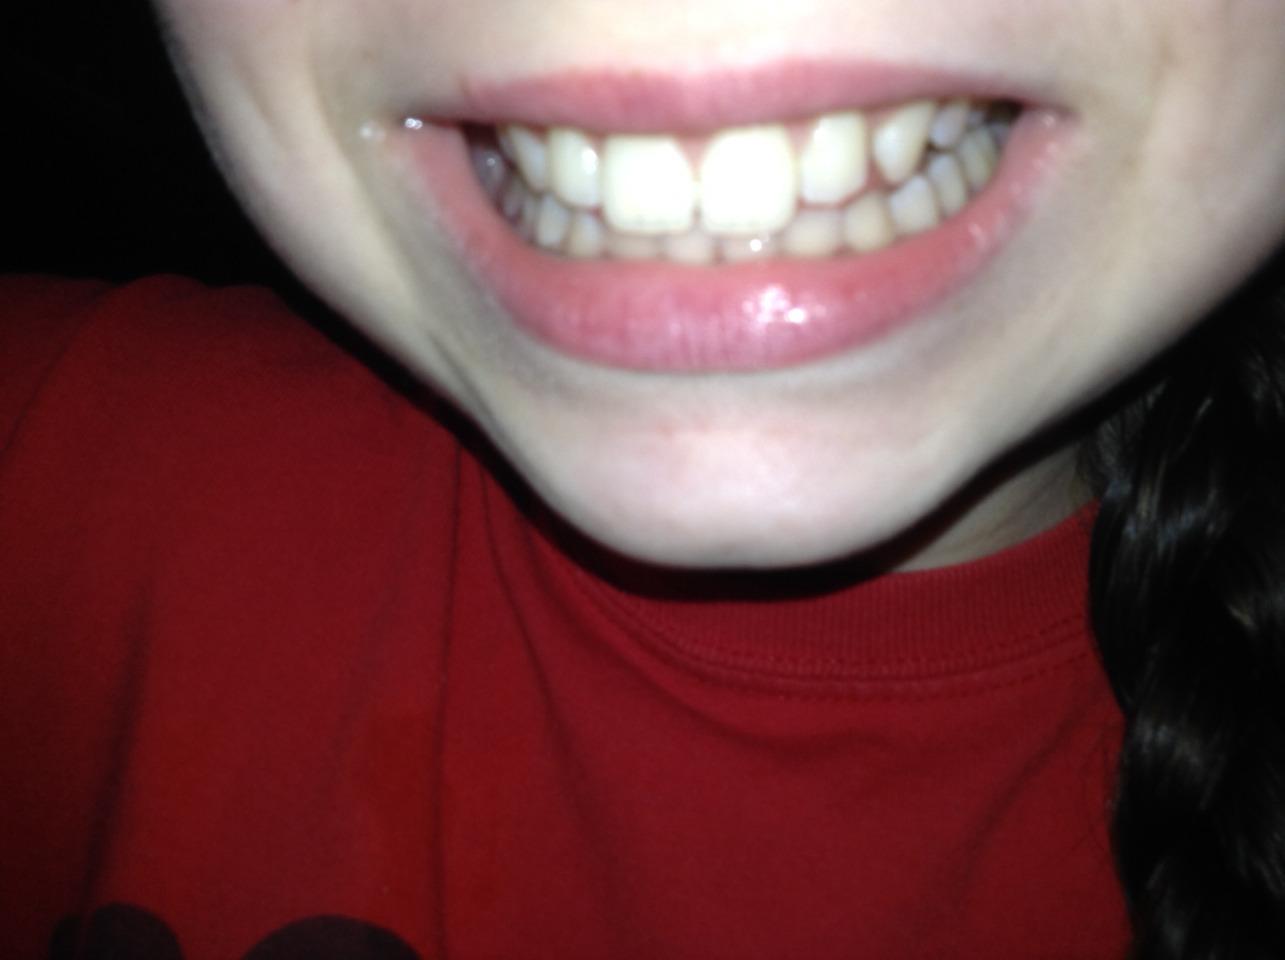 Want white teeth like this?